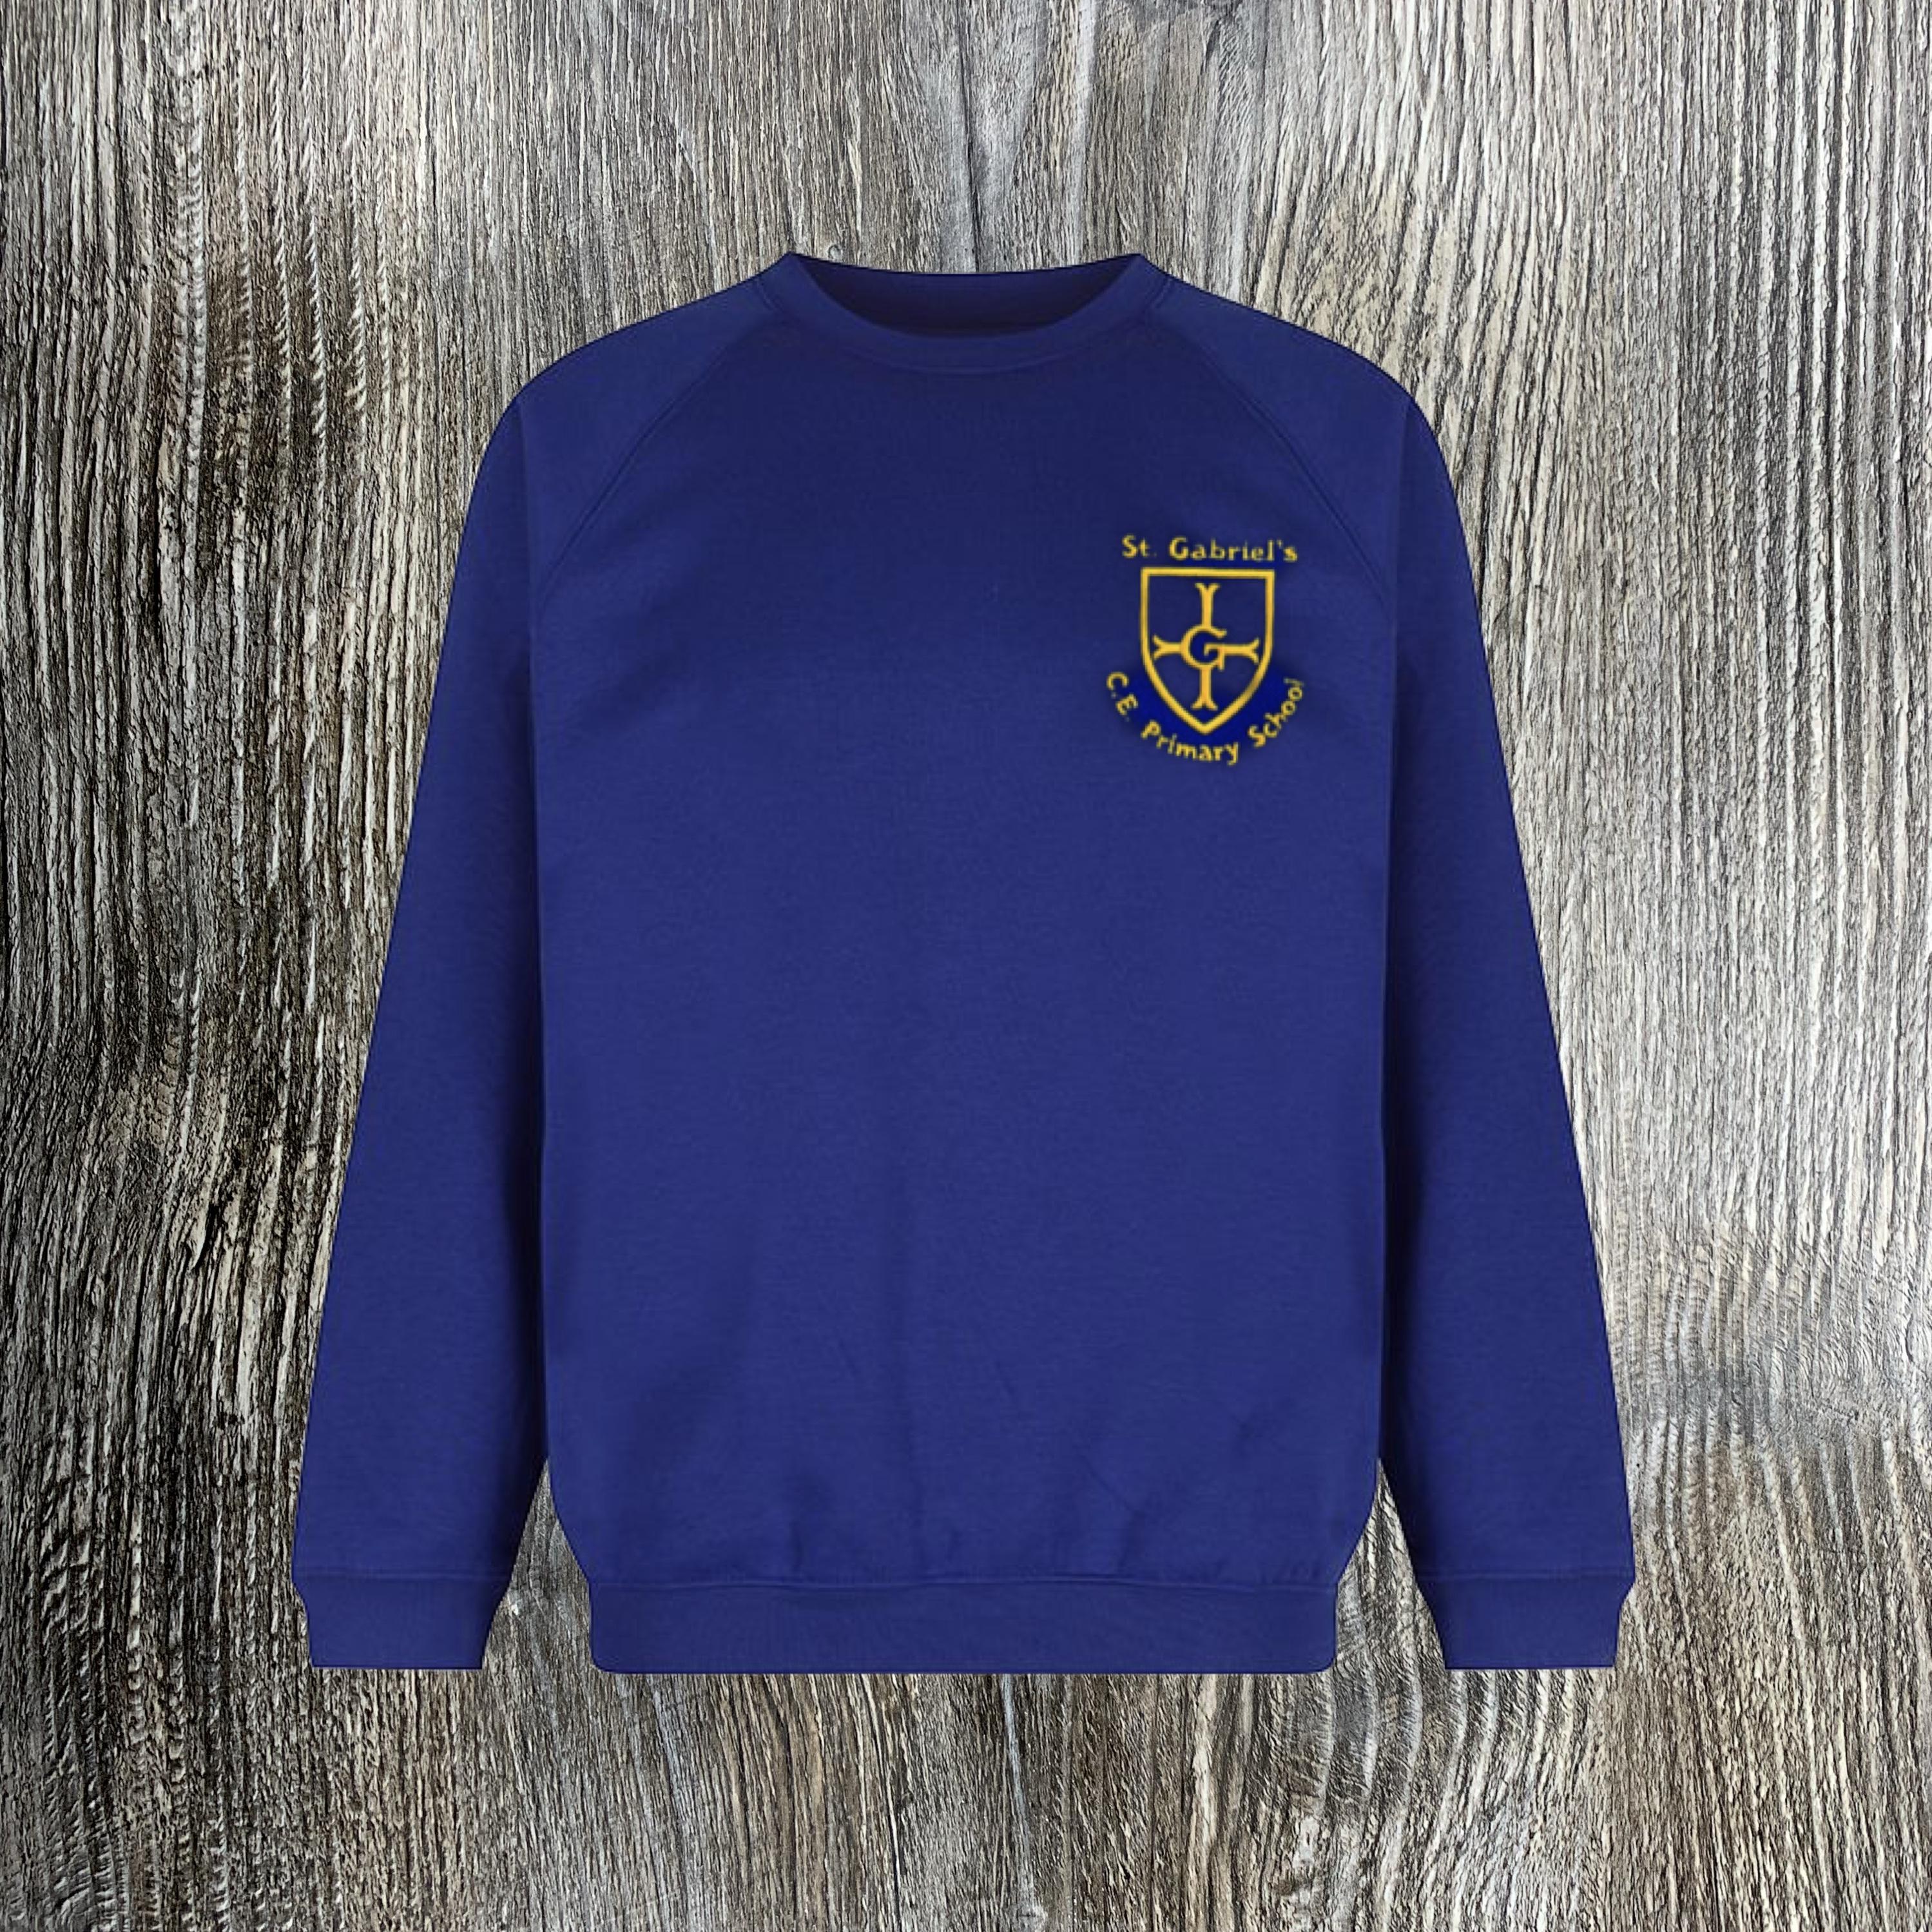 St Gabriels Sweatshirt